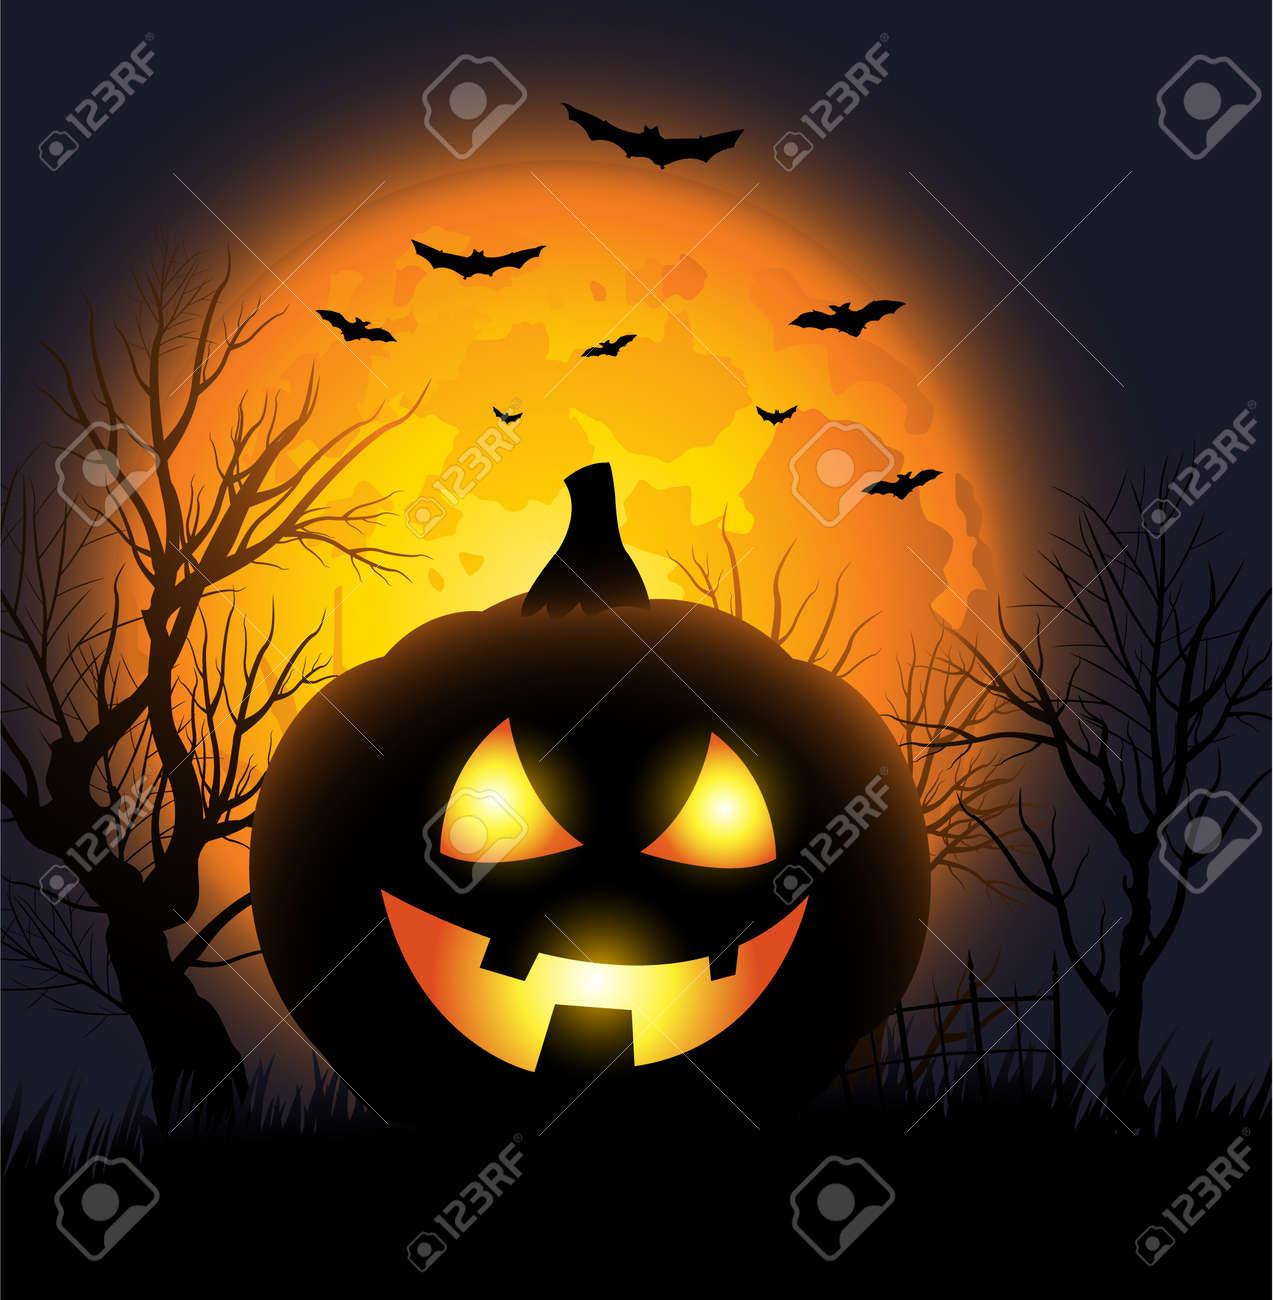 Scary Jack o lantern face Halloween background Stock Vector - 15136242